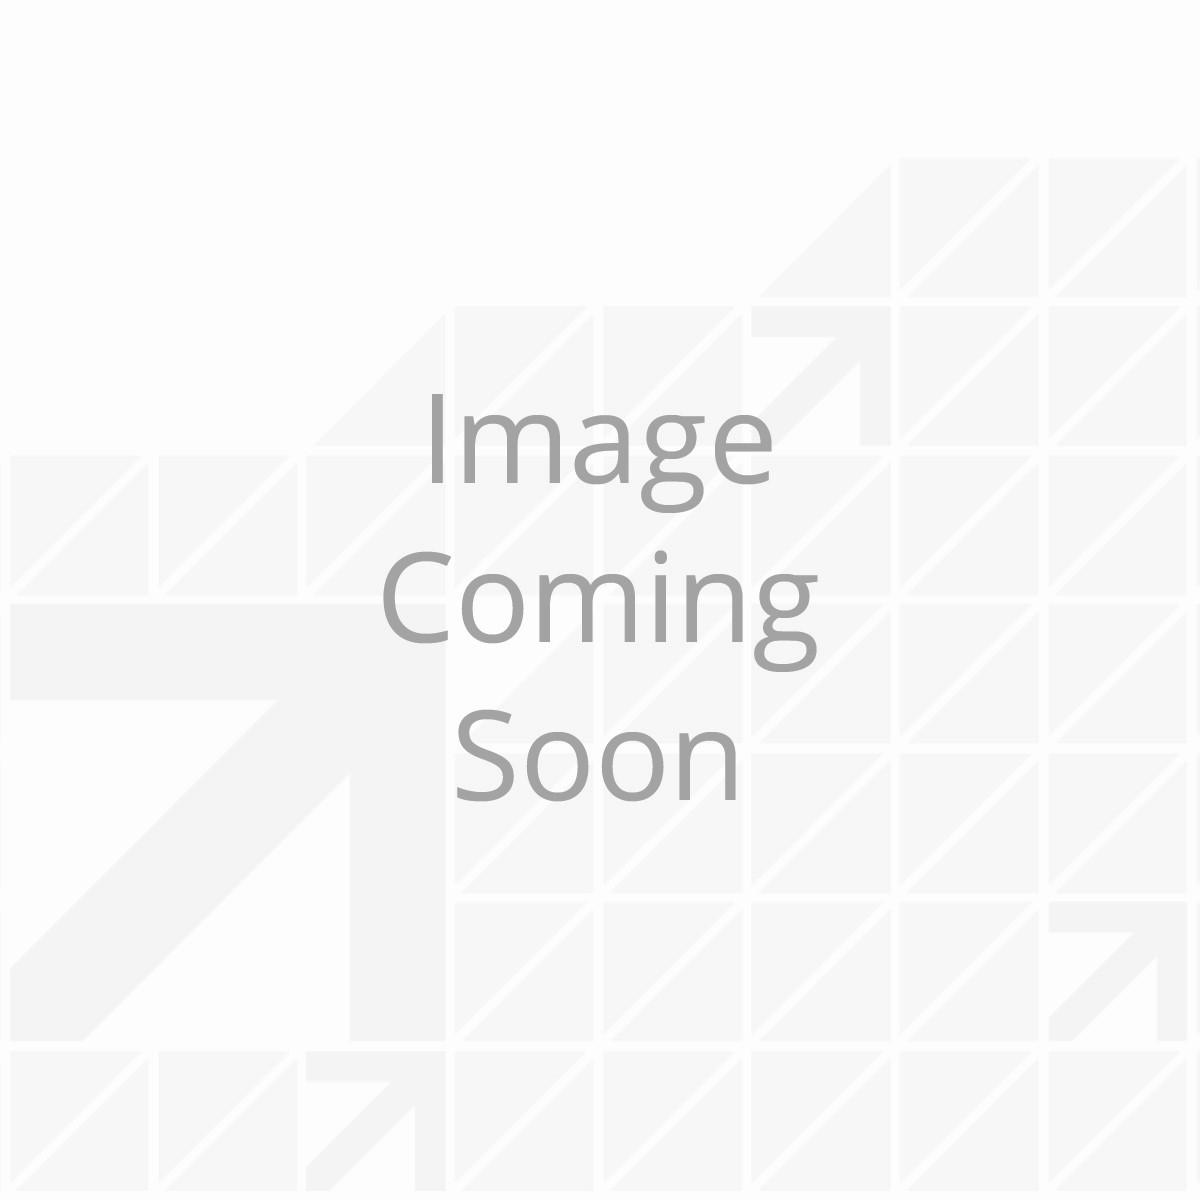 30A LED Cordset - 25' (Yellow)